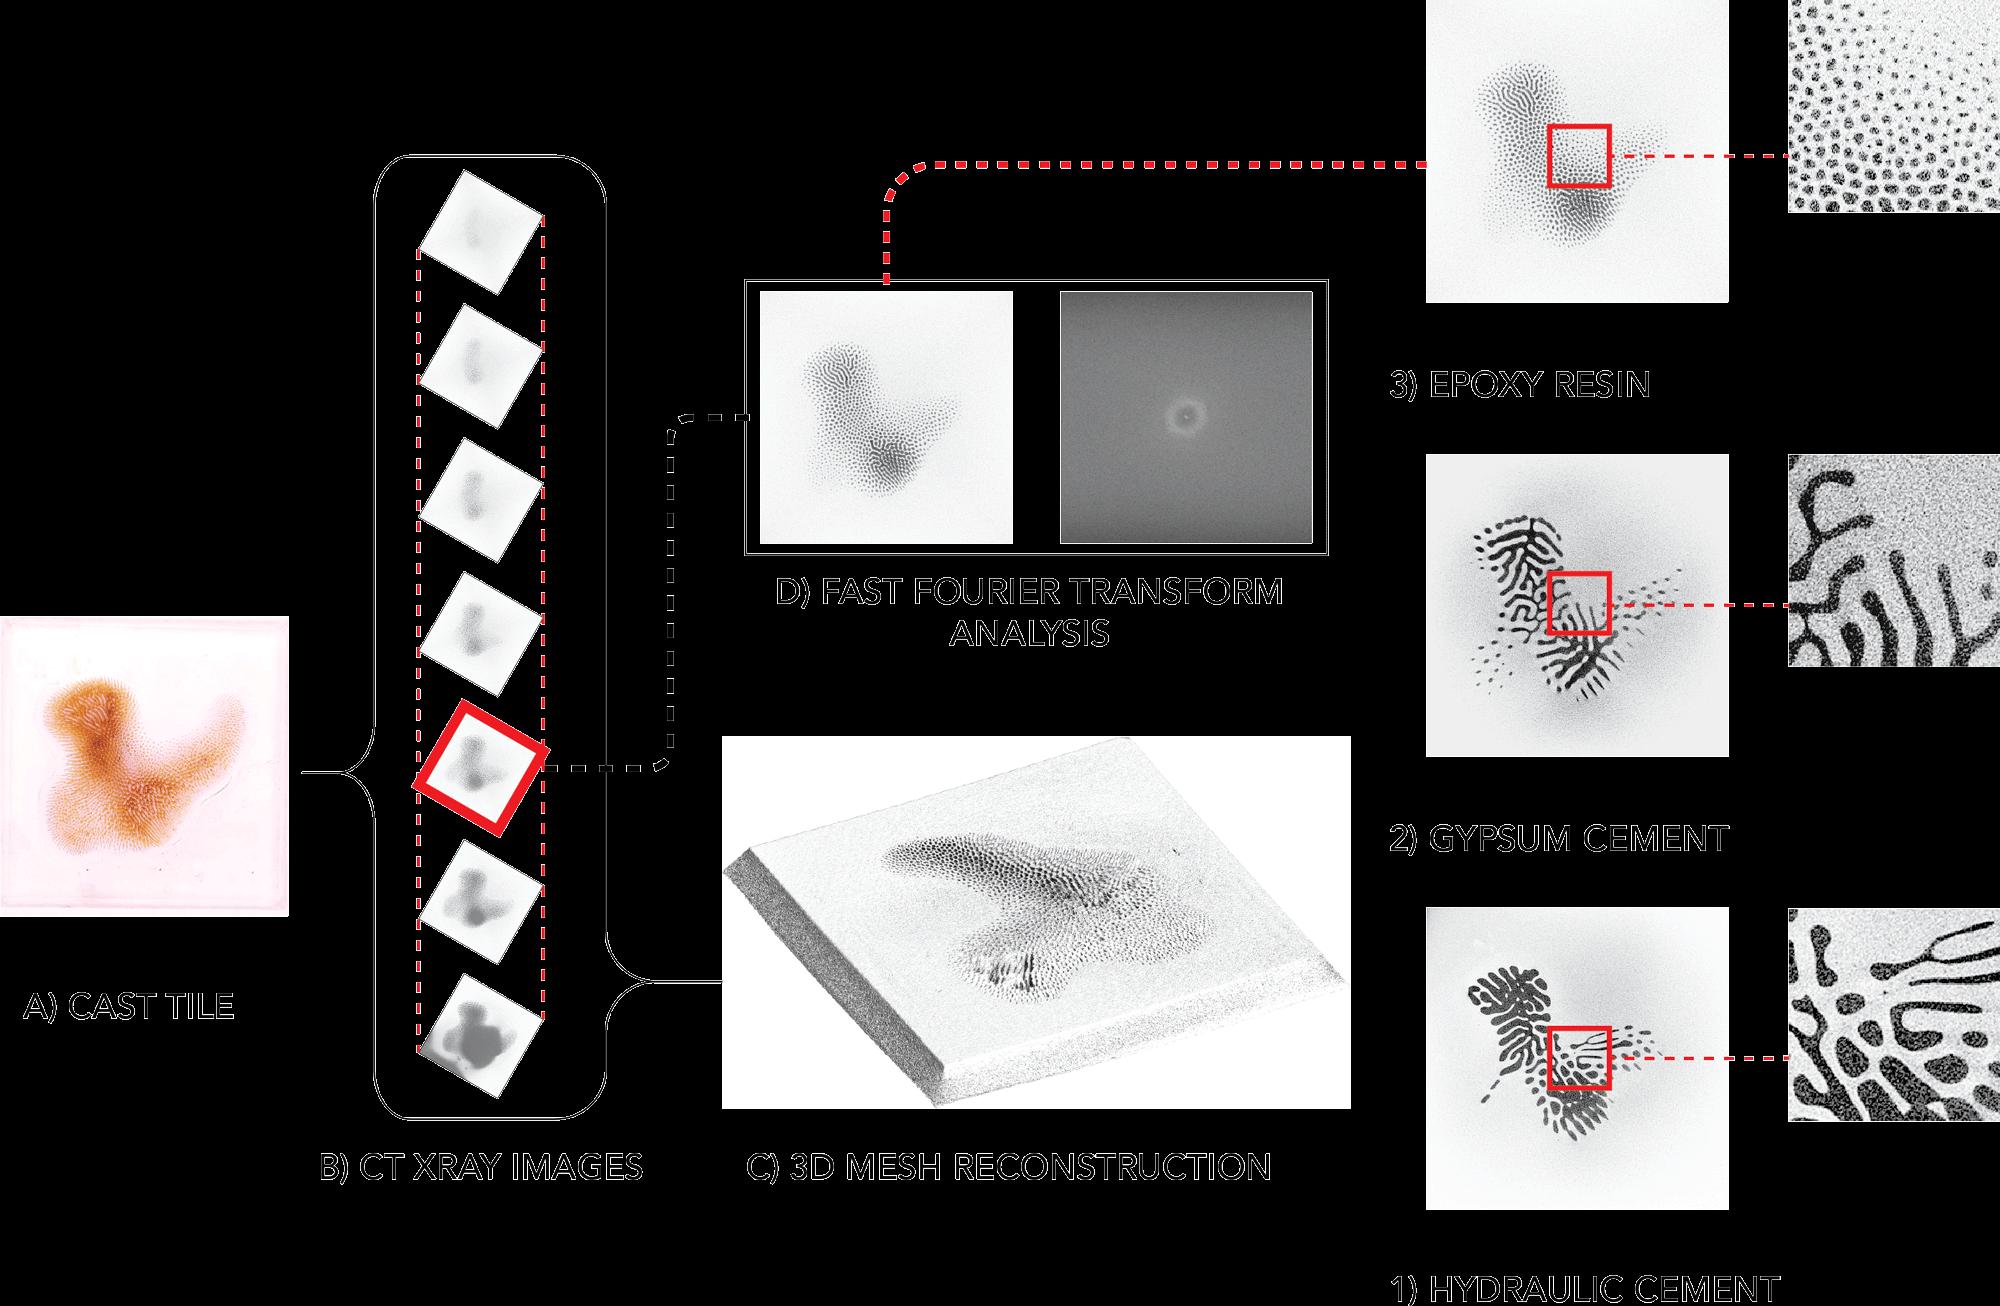 FFT analysis diagram